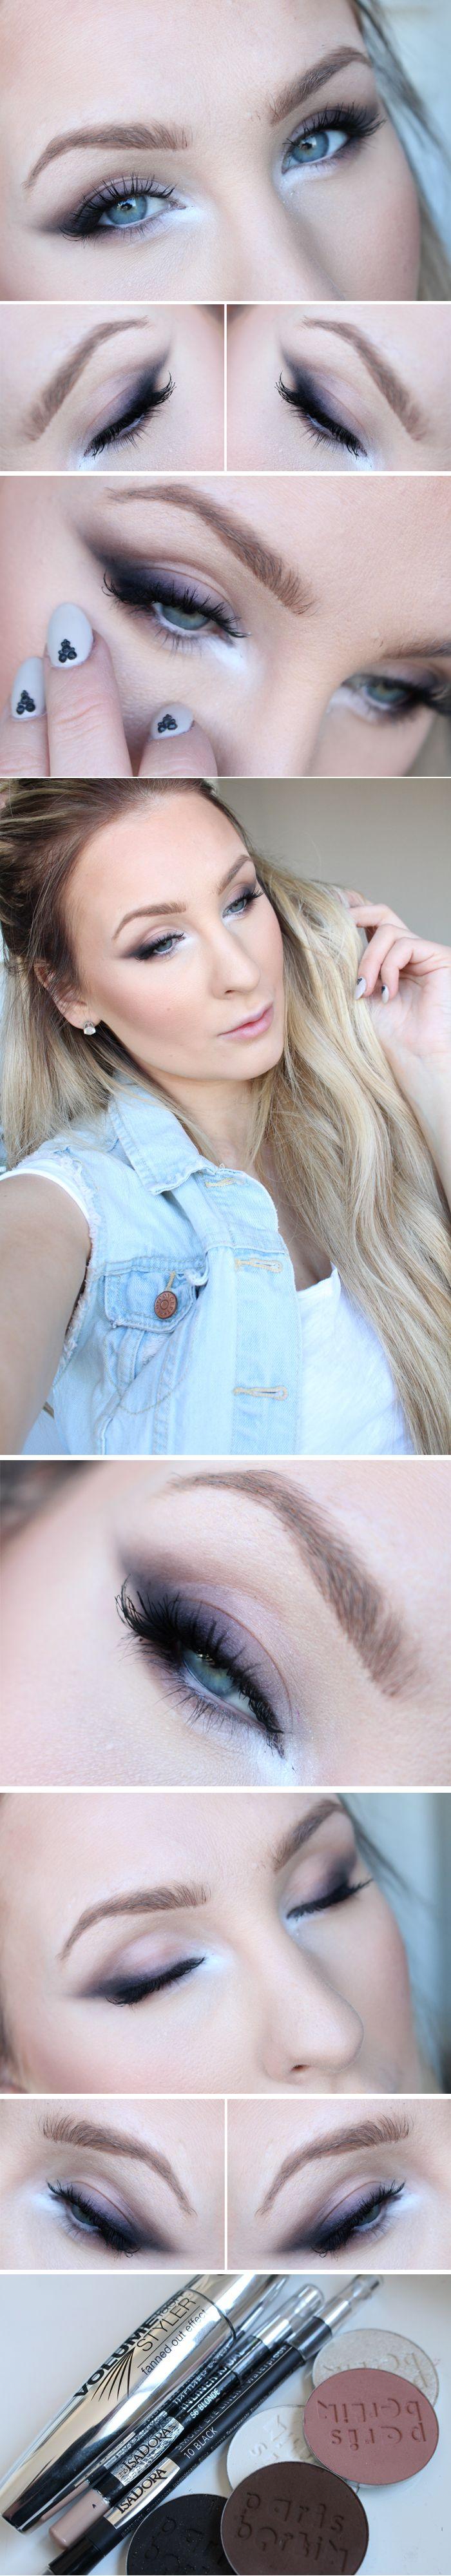 Helen Torsgården | Dagens ögonmakeup + tips - Sotad eyeliner